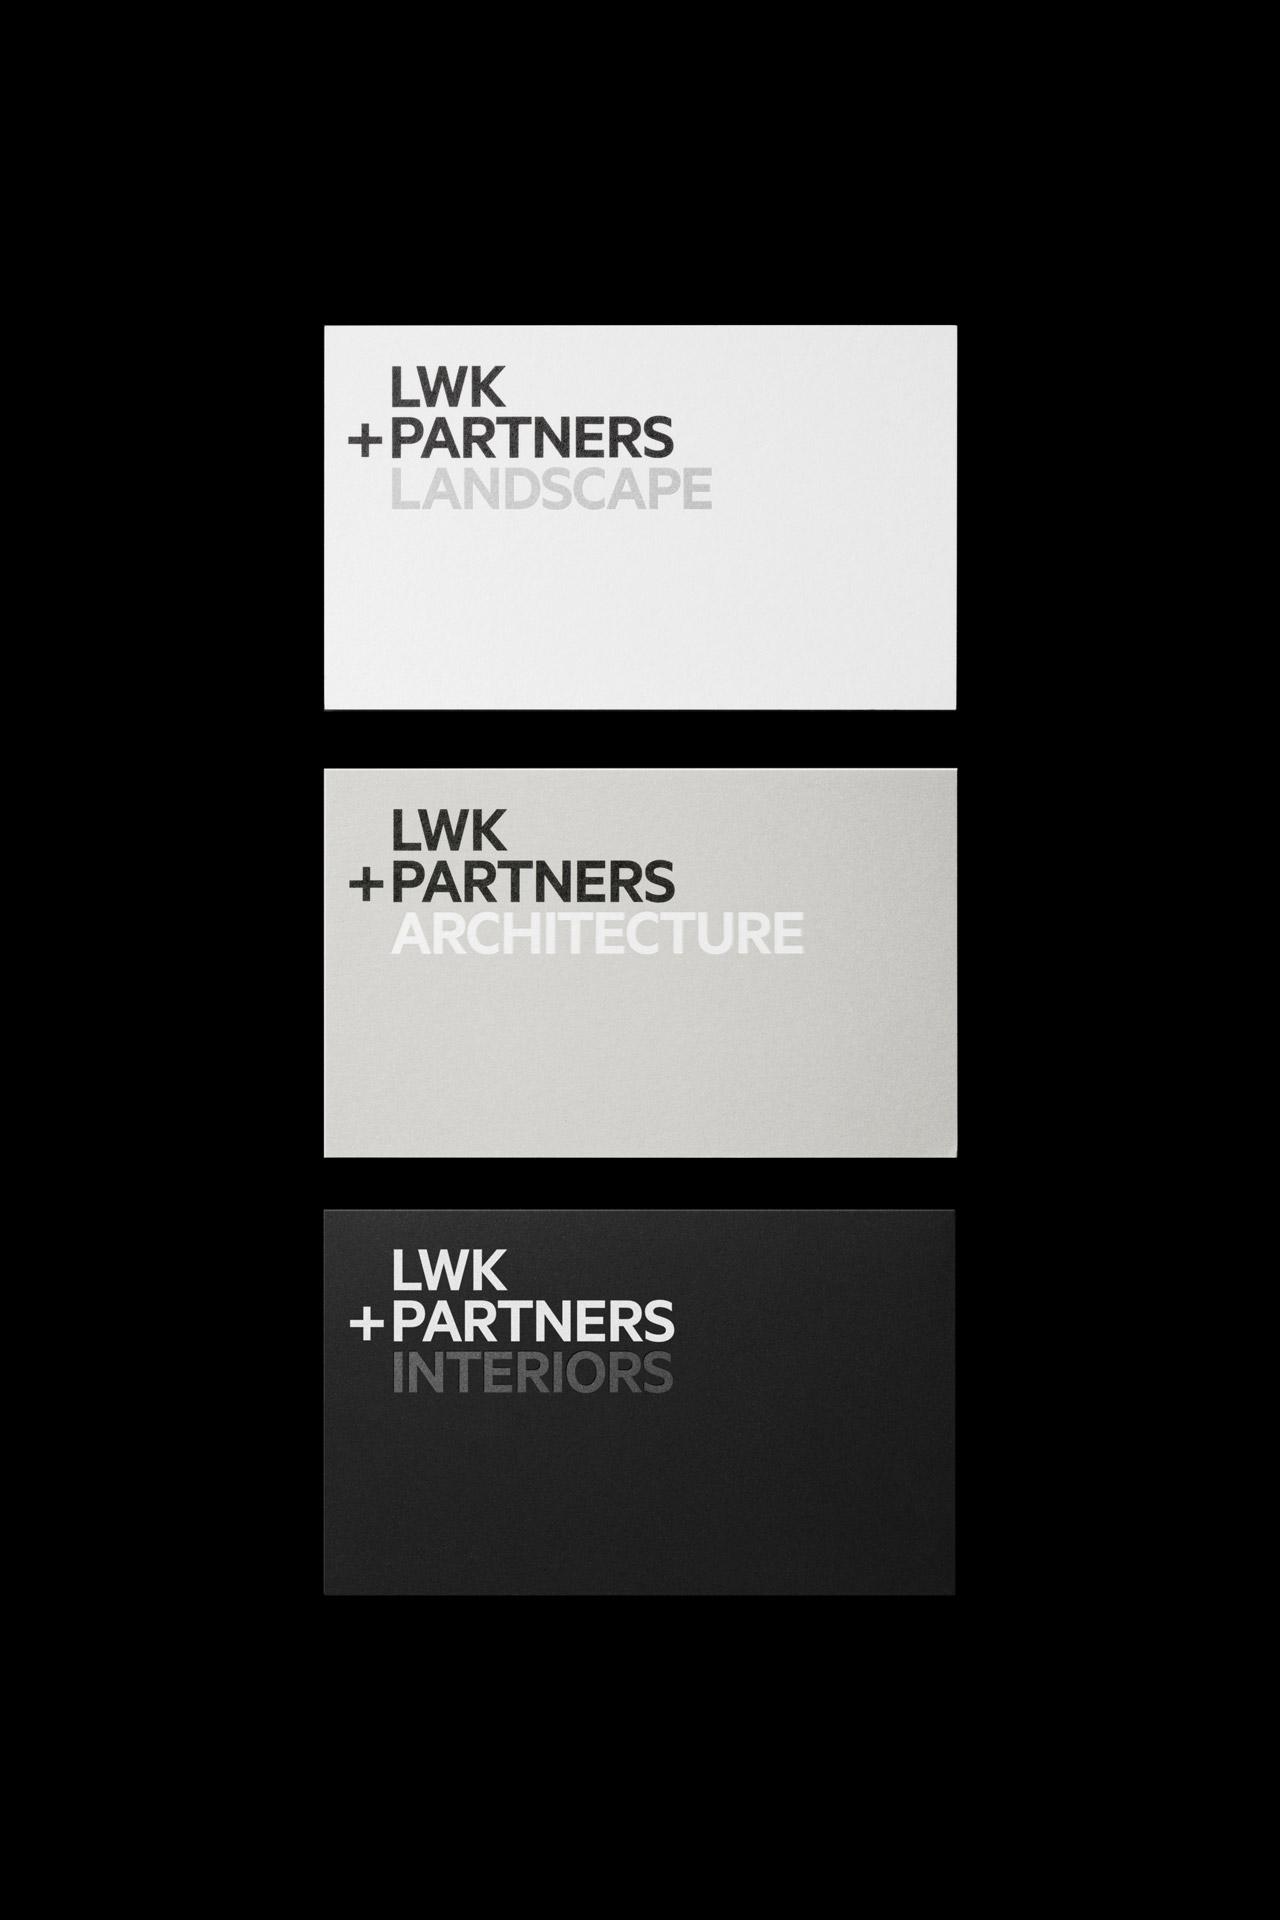 lwk-partners_04